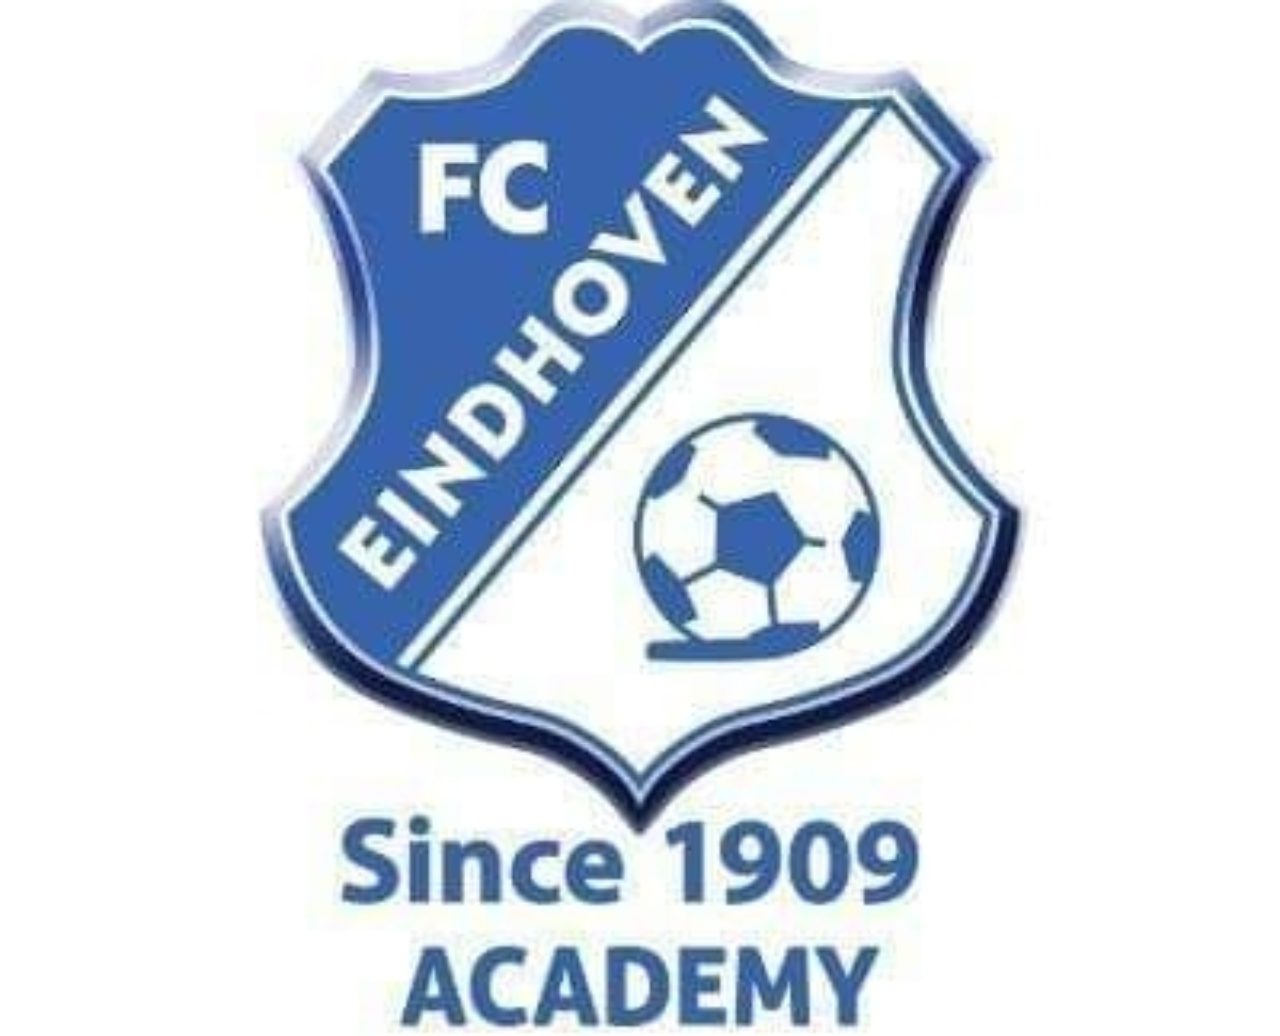 Eindhoven1909.nl sponsort speler FCE Academy